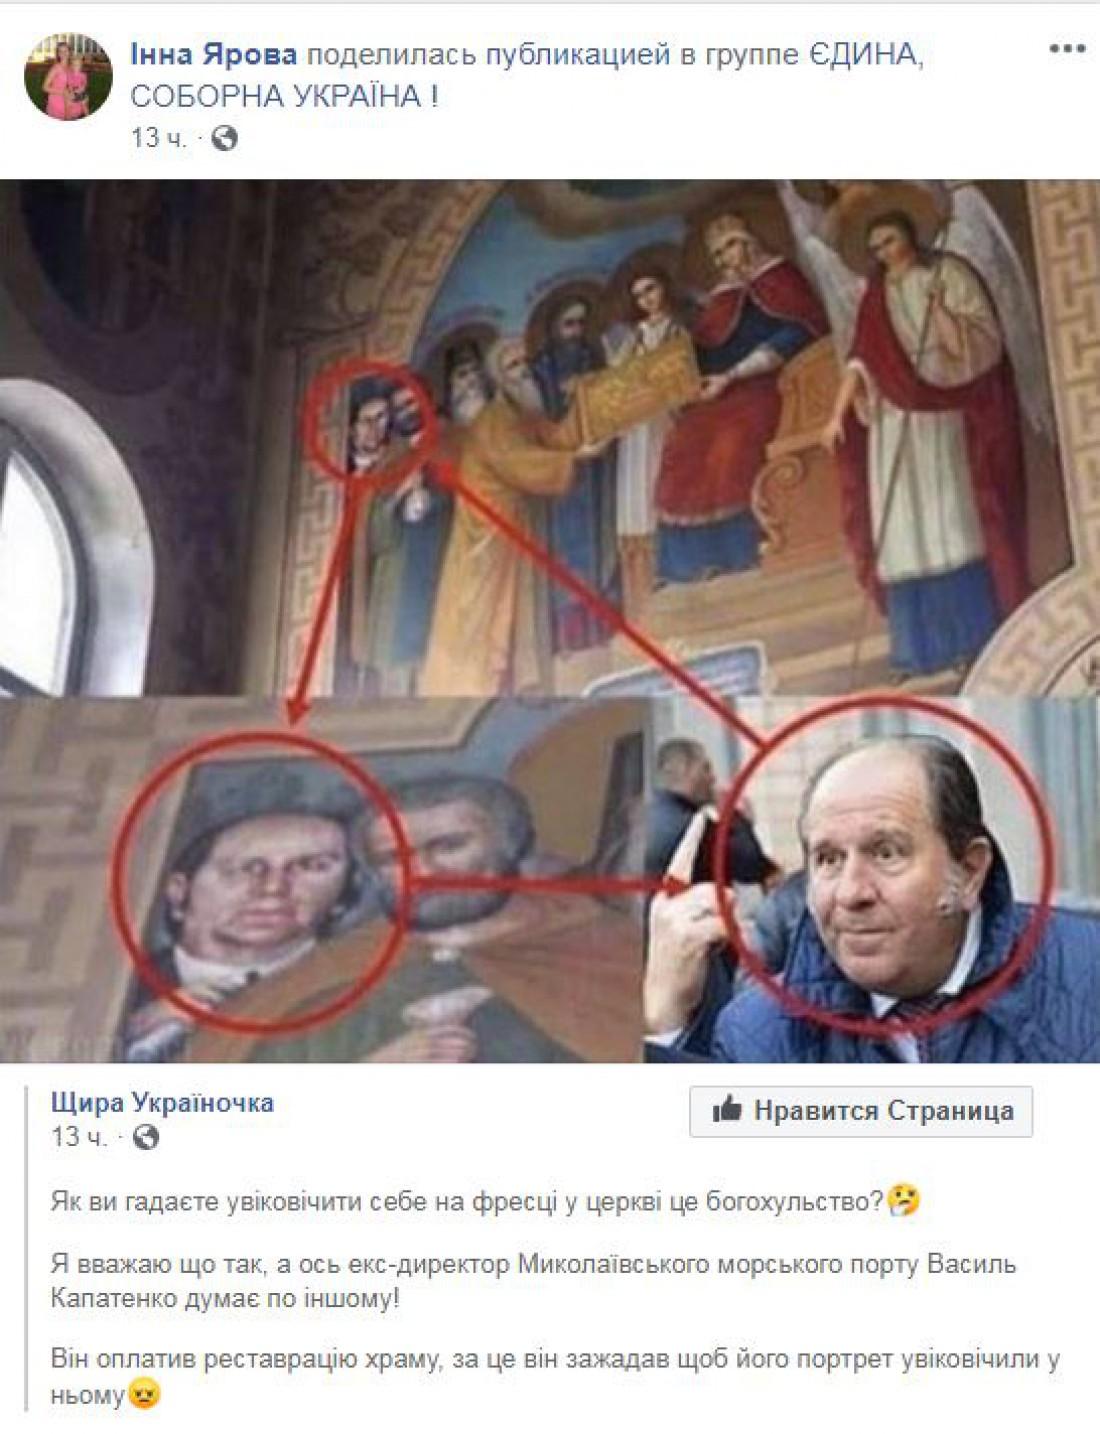 Спонсор церкви - Василий Капатенко